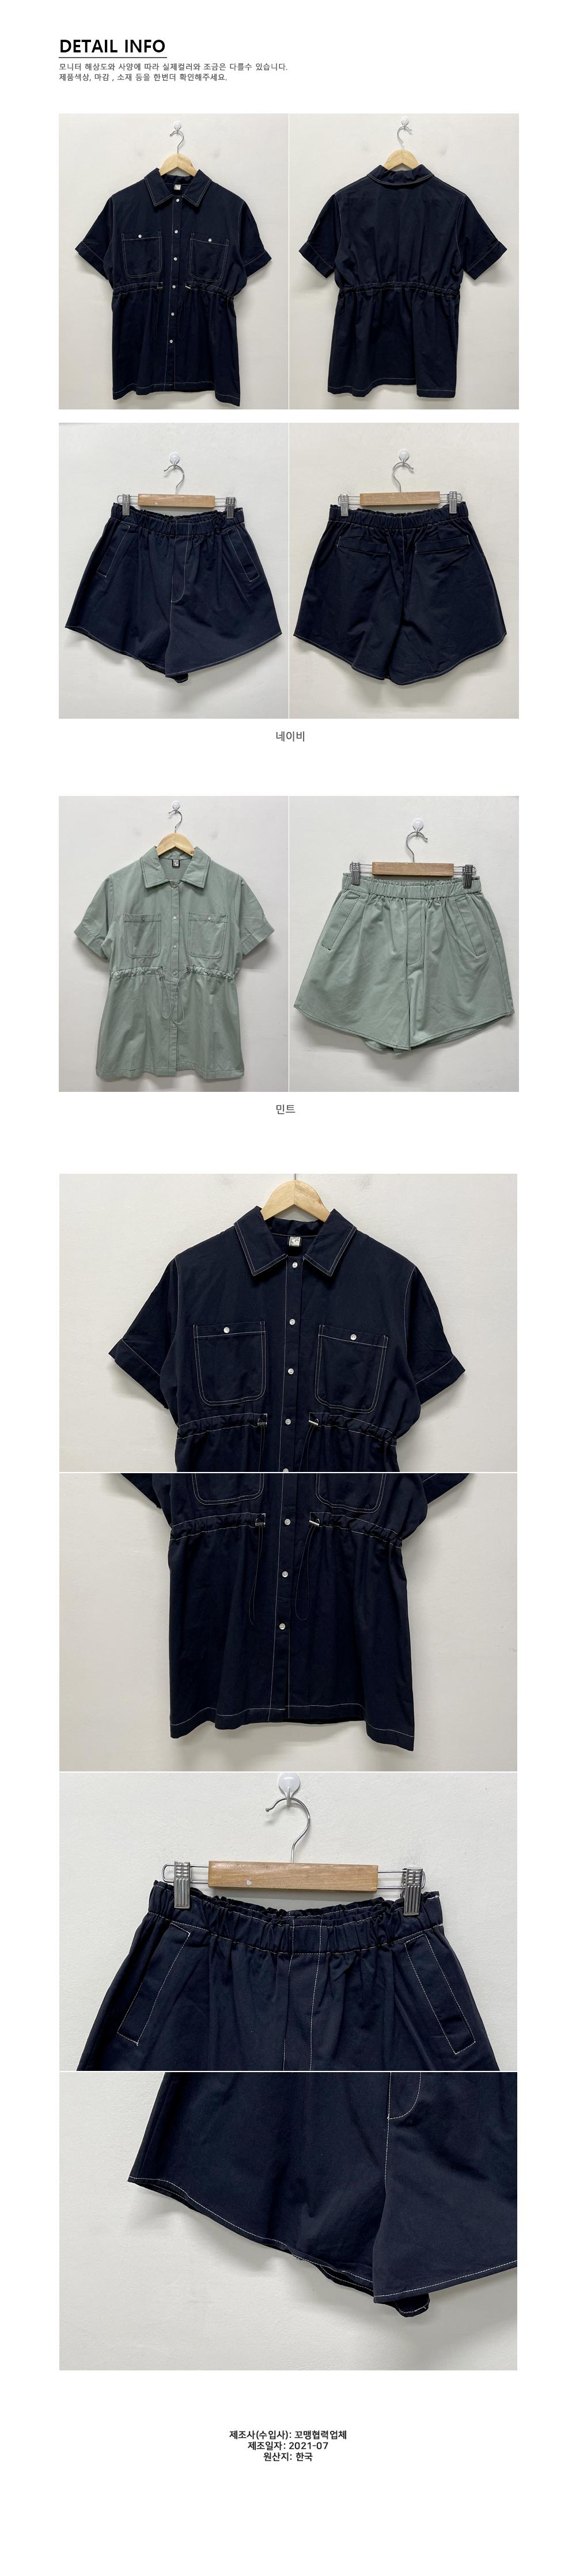 Stitch String Short Sleeve Shirt + Shorts Set